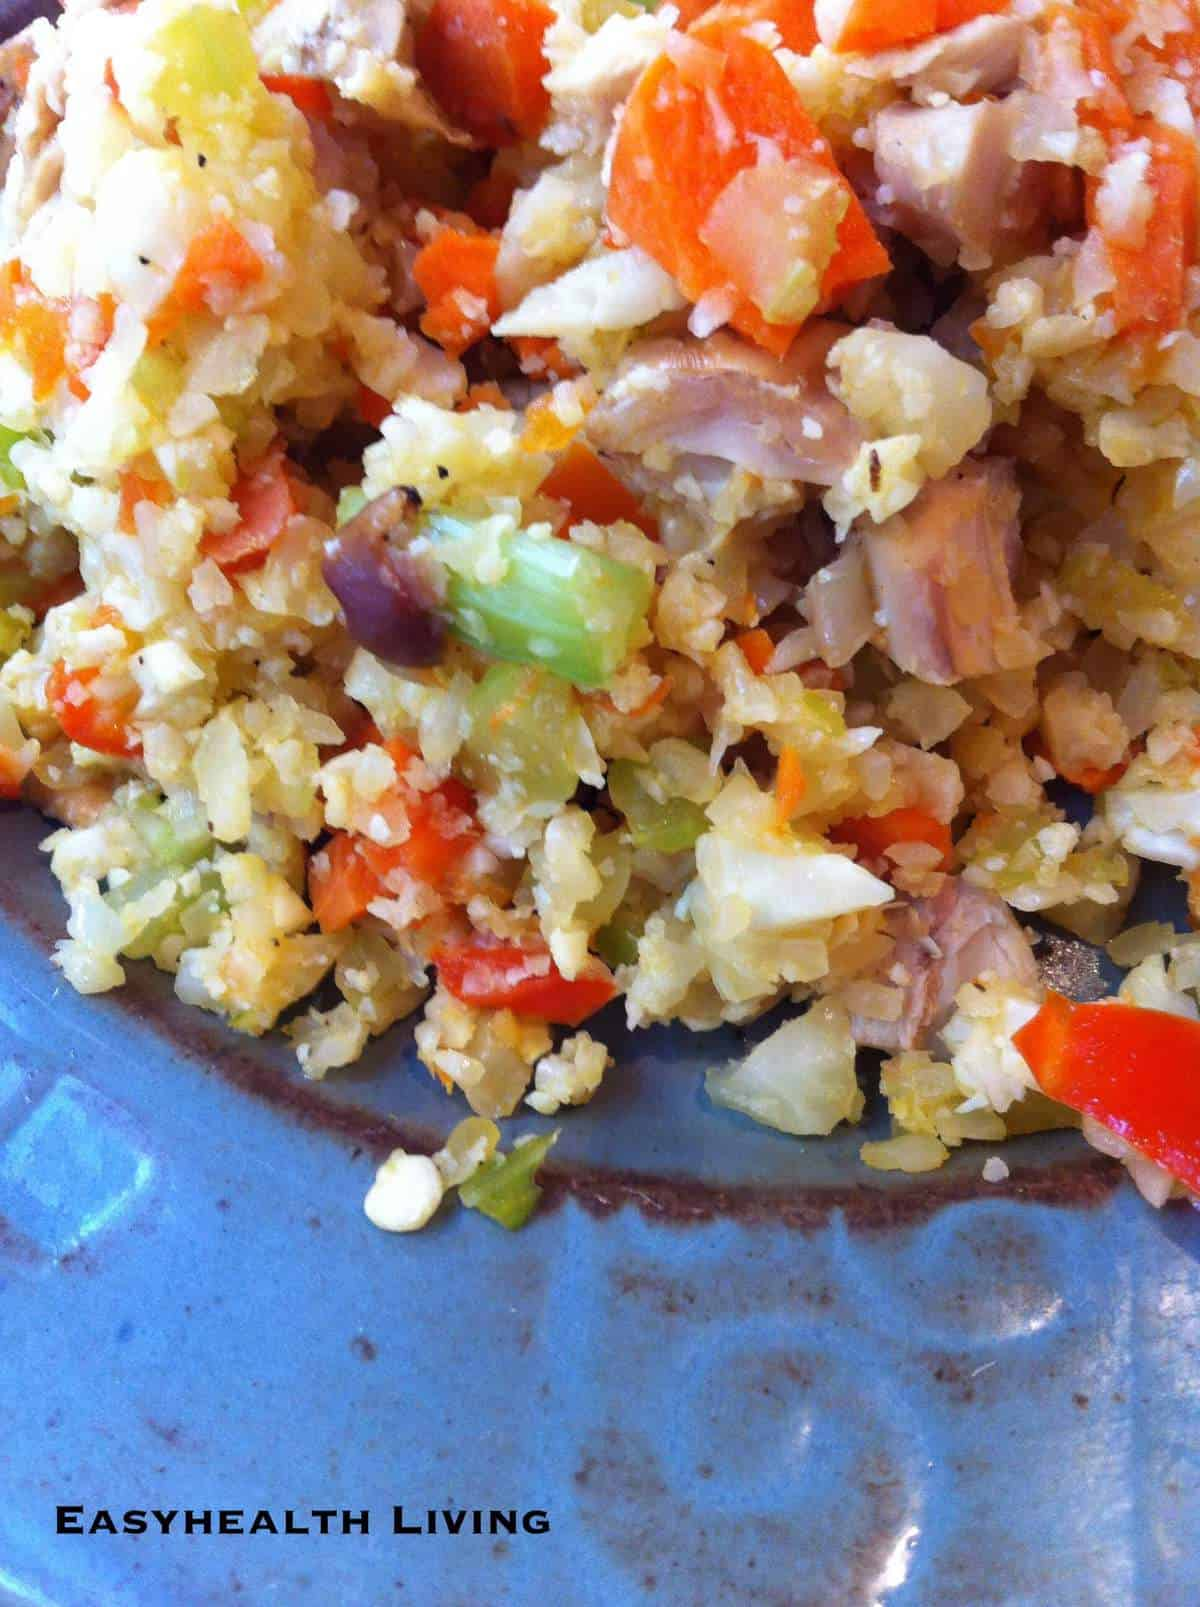 Turkey Ham Leftover Recipes Low Carb Stir Fried Cauliflower Rice With Turkey Easyhealth Living